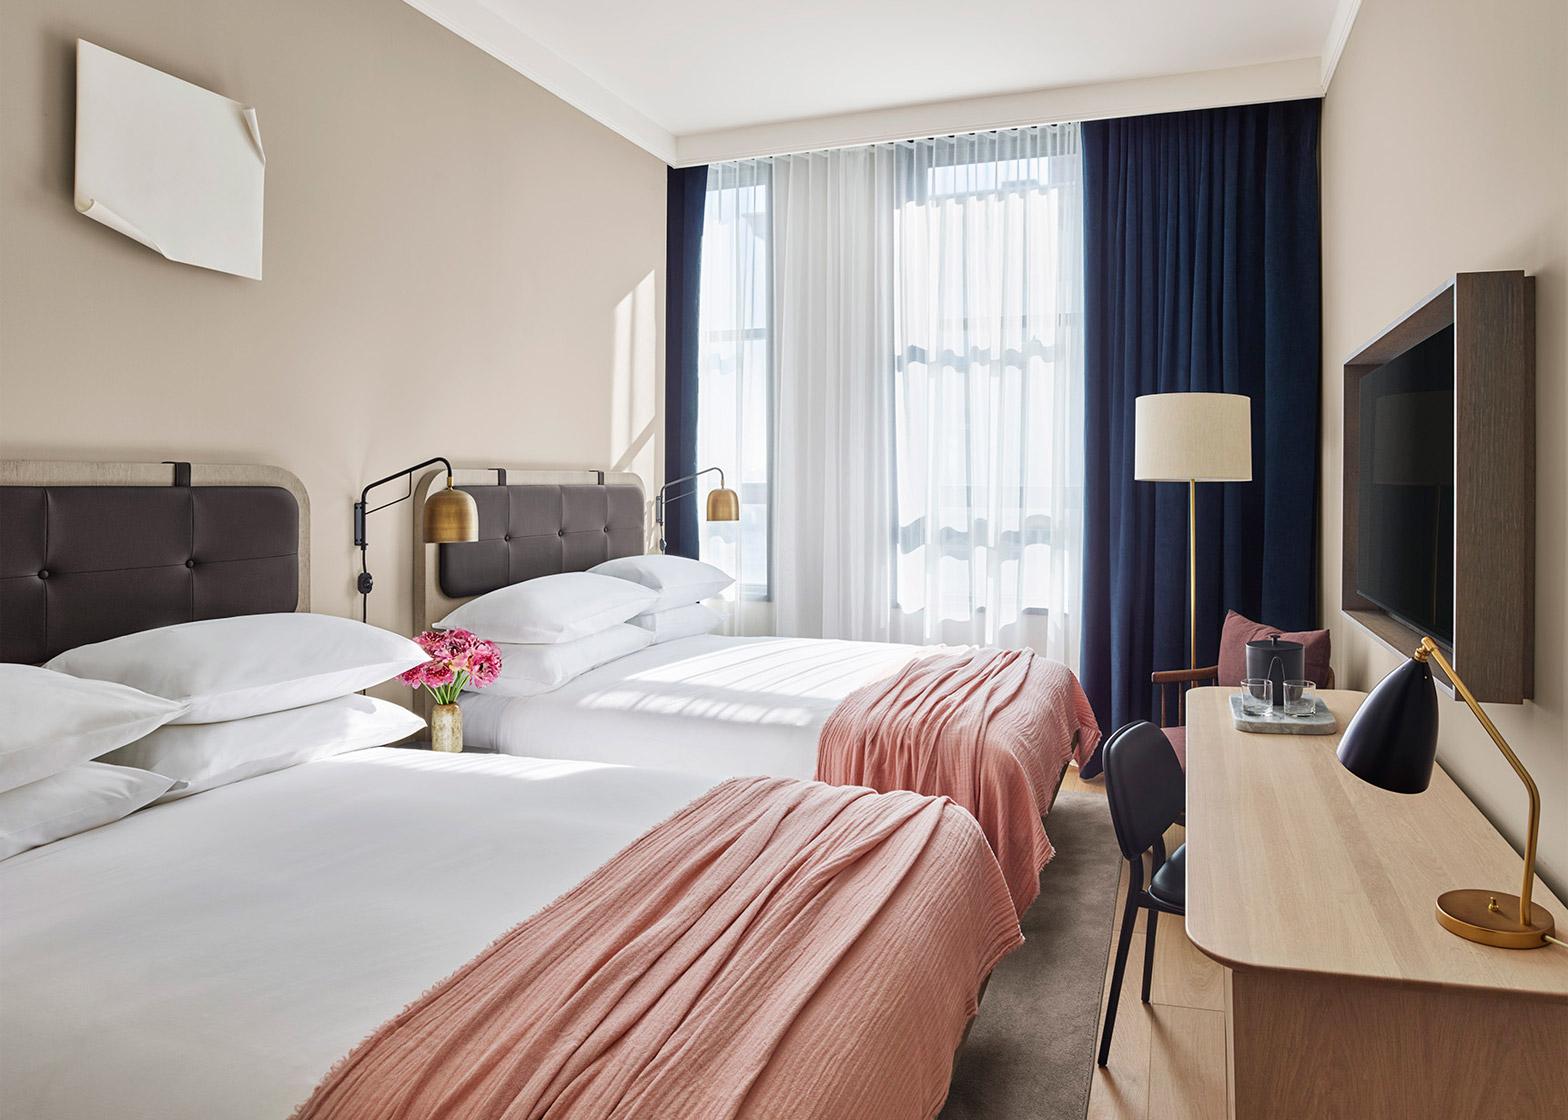 11-howard-space-copenhagen-hotel-interior-new-york-city-soho-usa_dezeen_1568_11